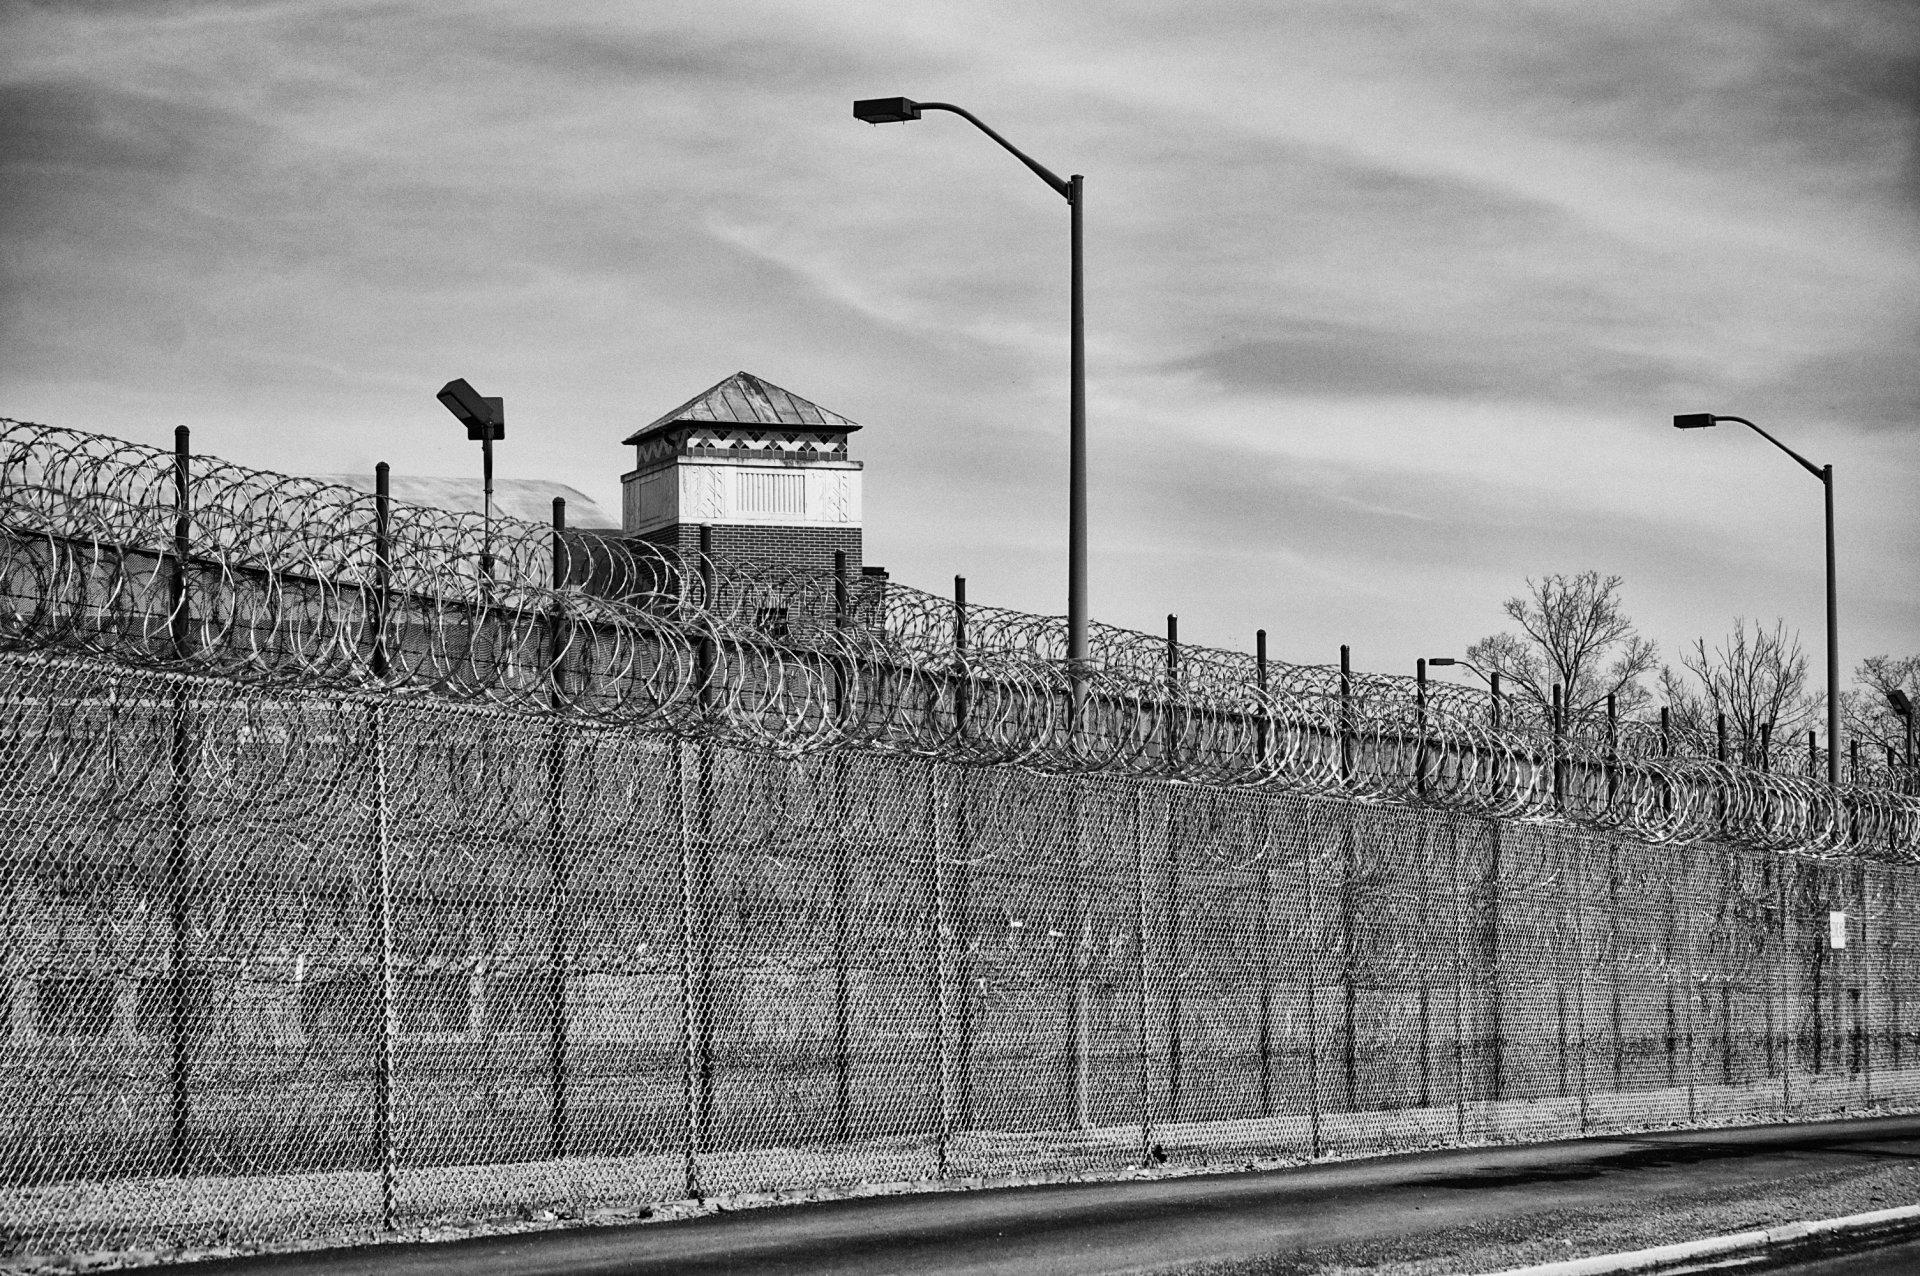 Prison fence in black and white.   Photo courtesy Brad Kozlek